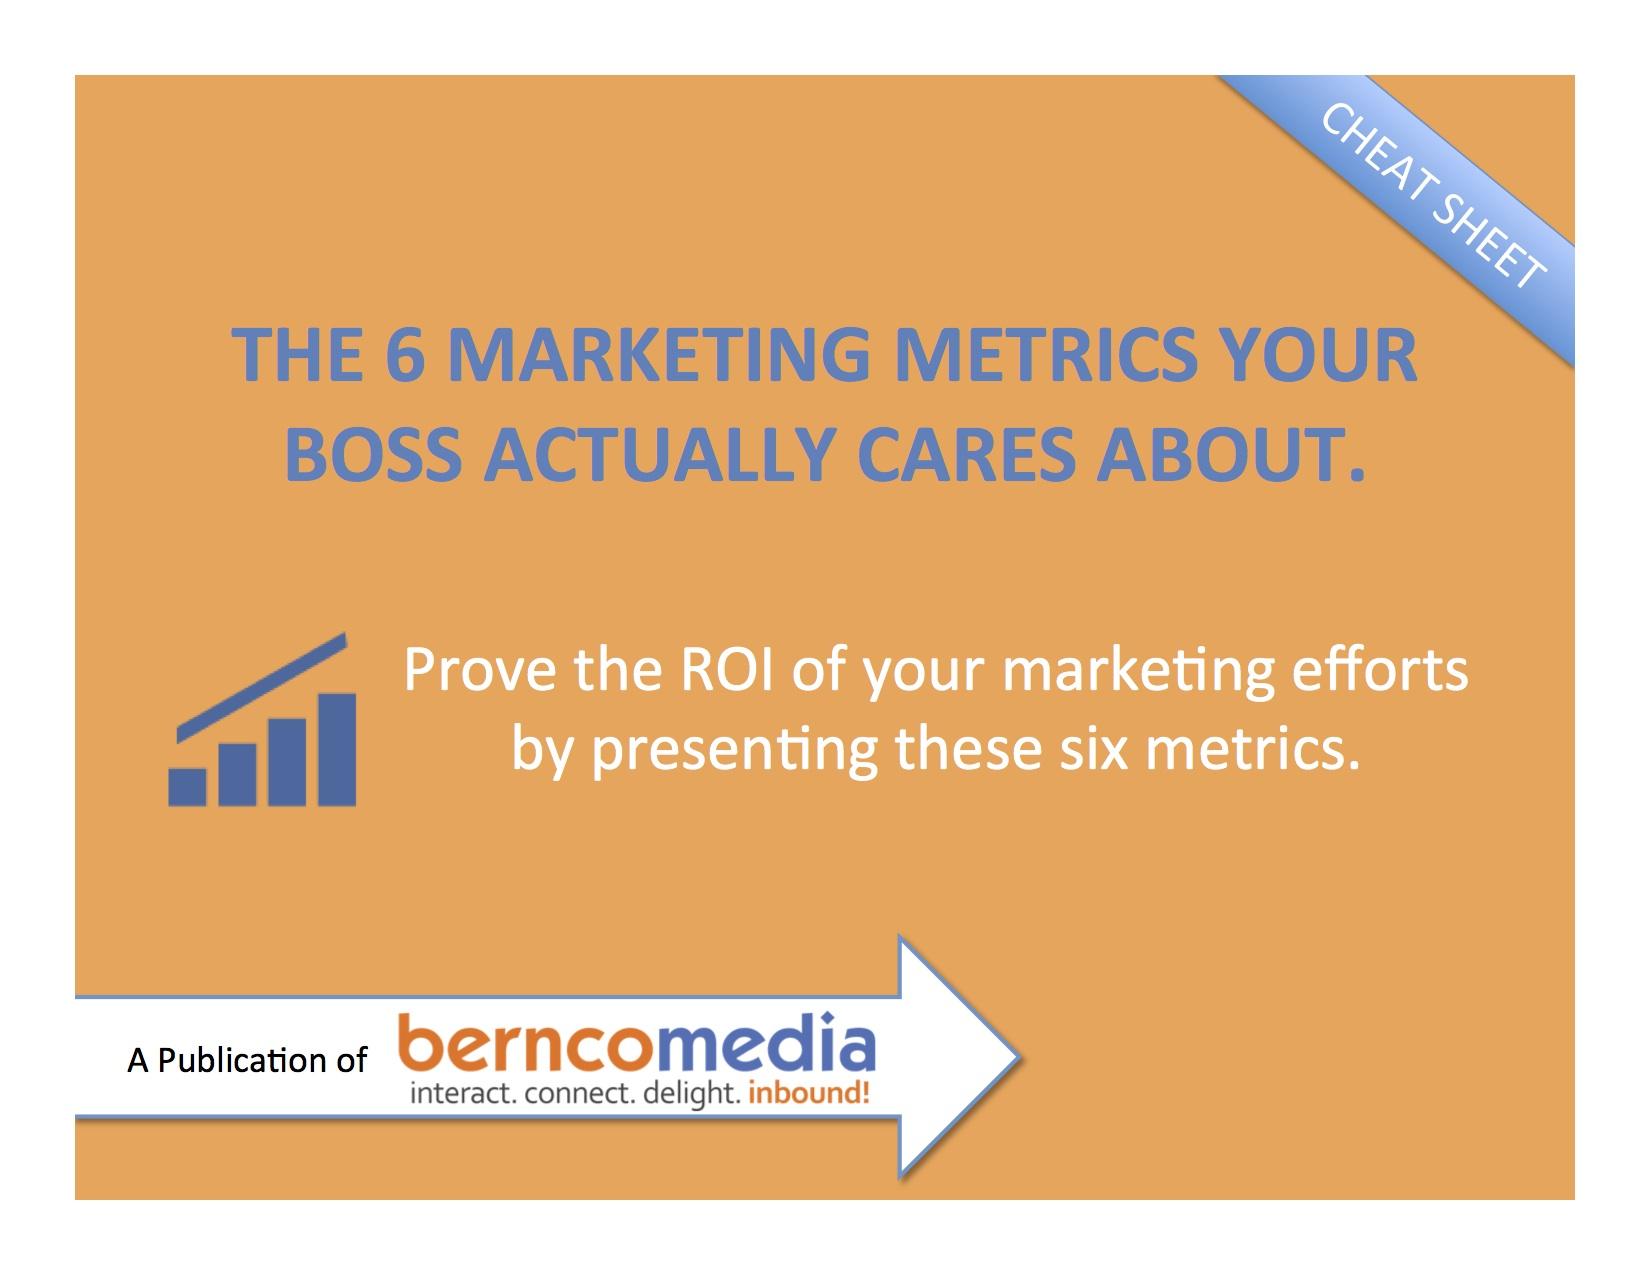 Bernco Media 6 Marketing Metrics Your Boss Cares About